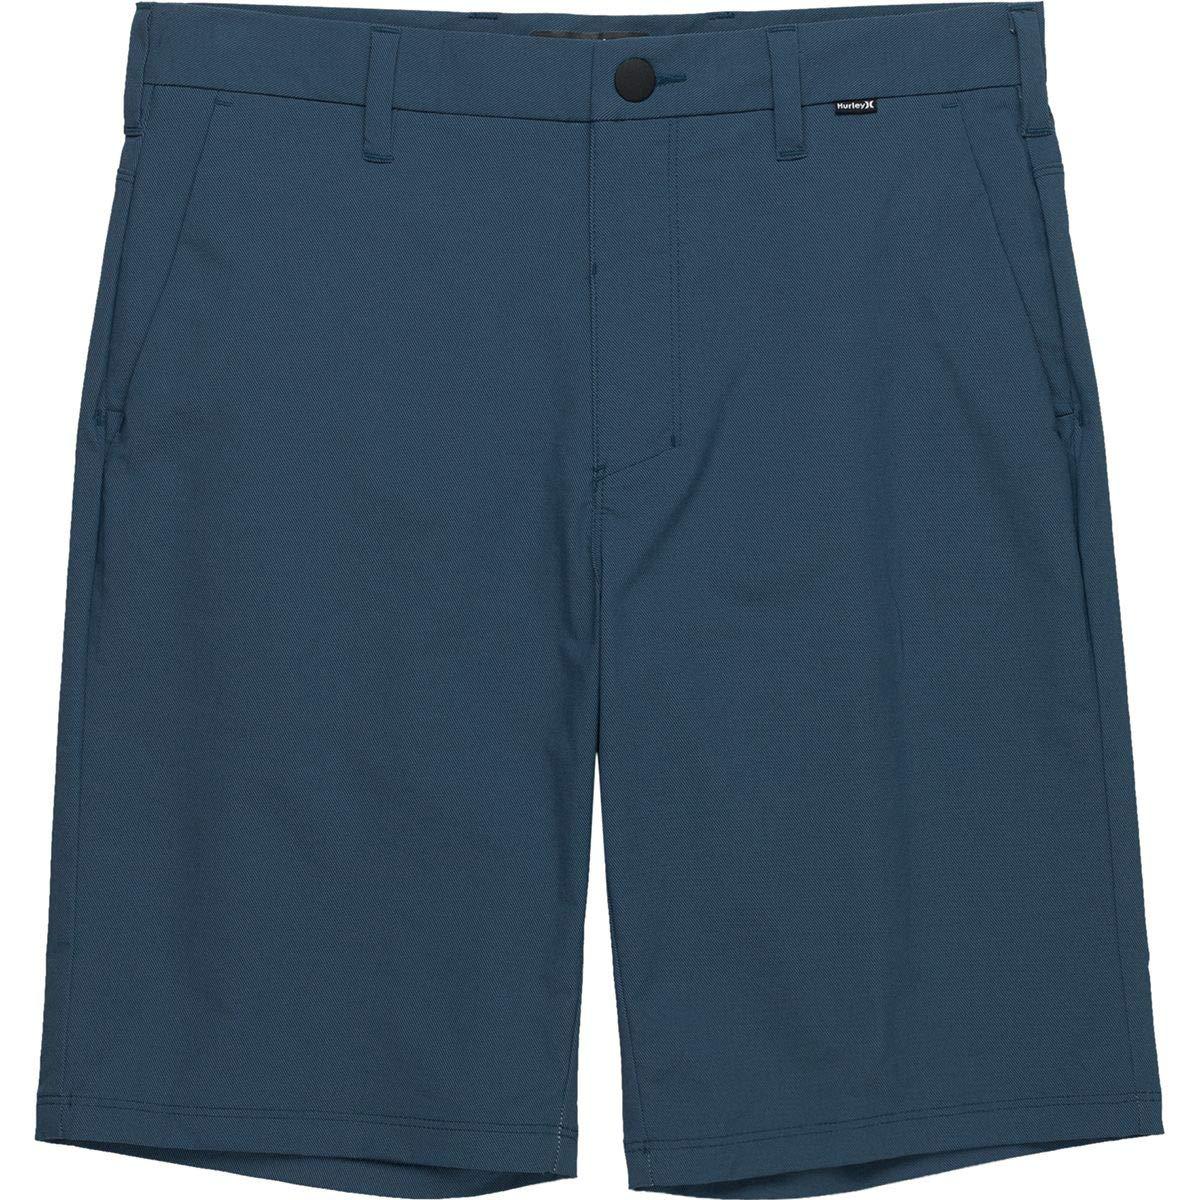 Hurley Mens Dri-fit Chino 22 Walk Short